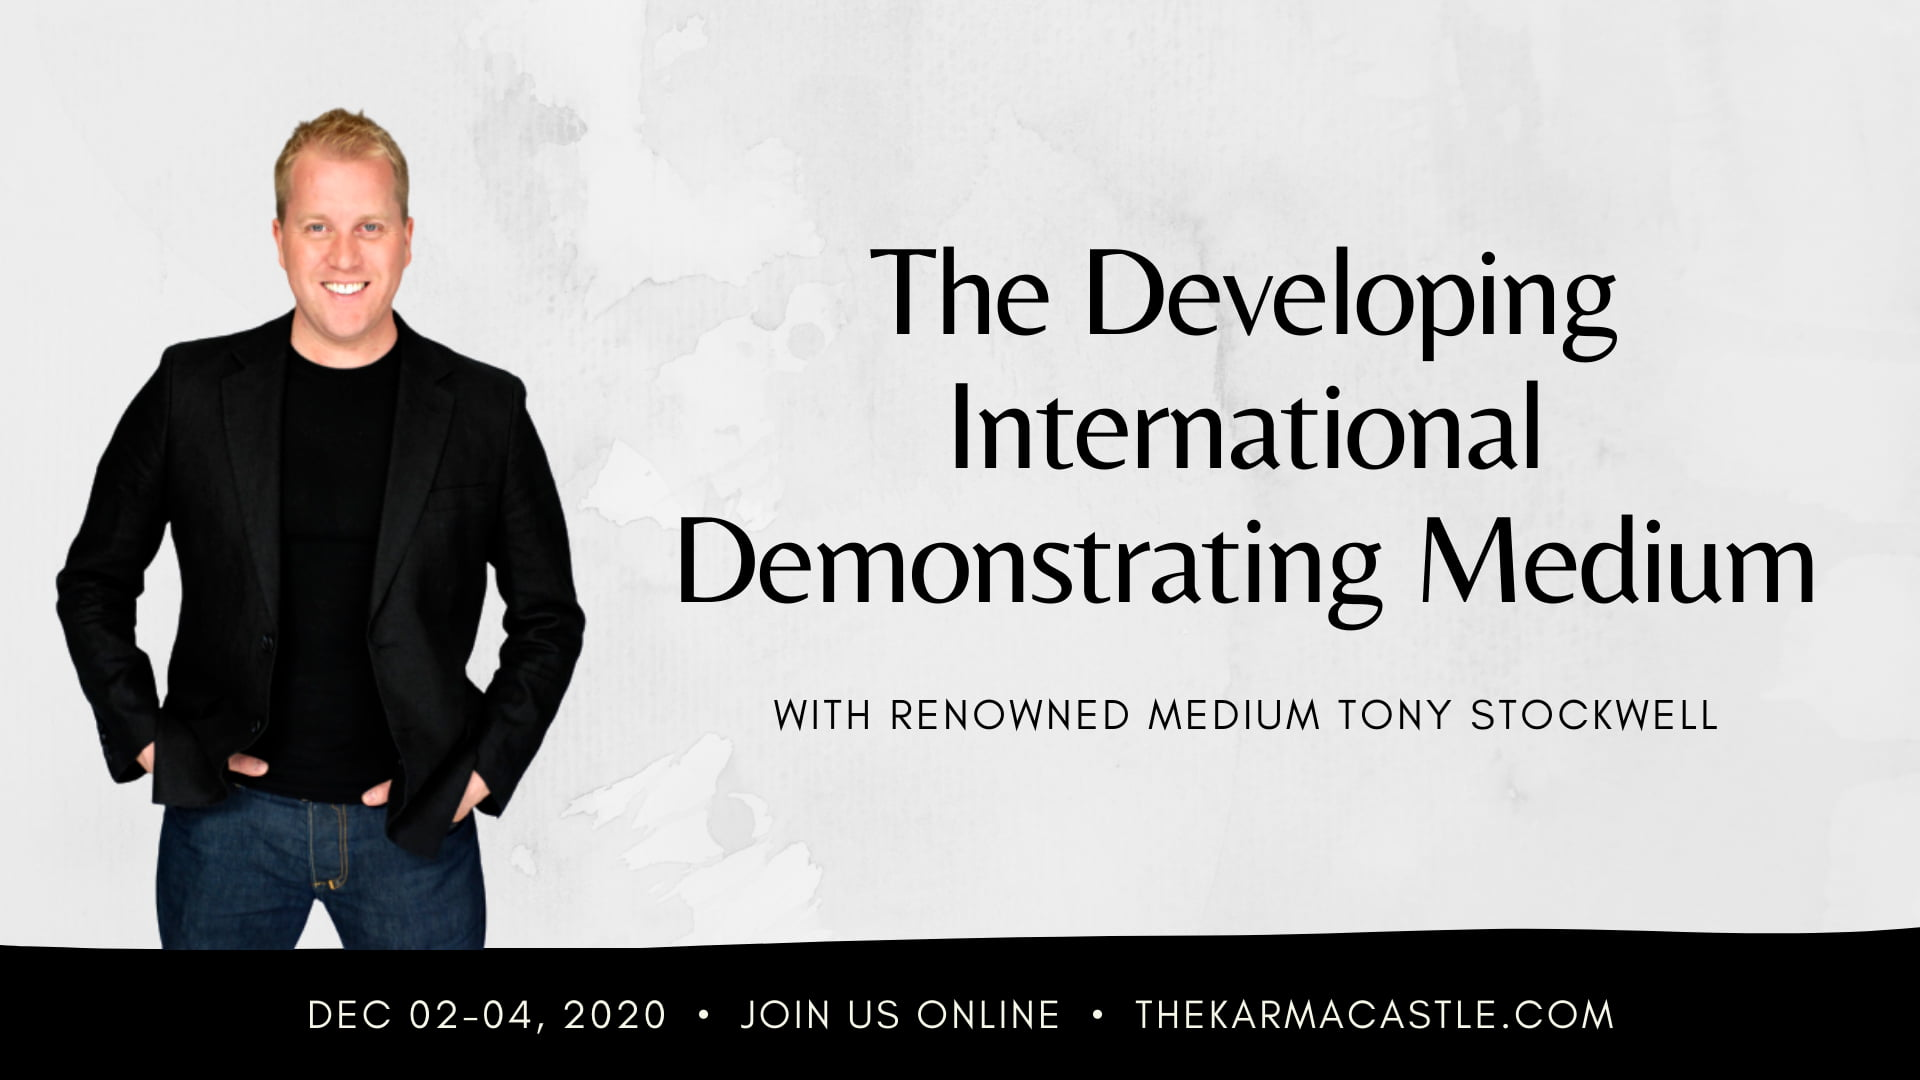 Tony Stockwell - The Developing International Demonstrating Medium